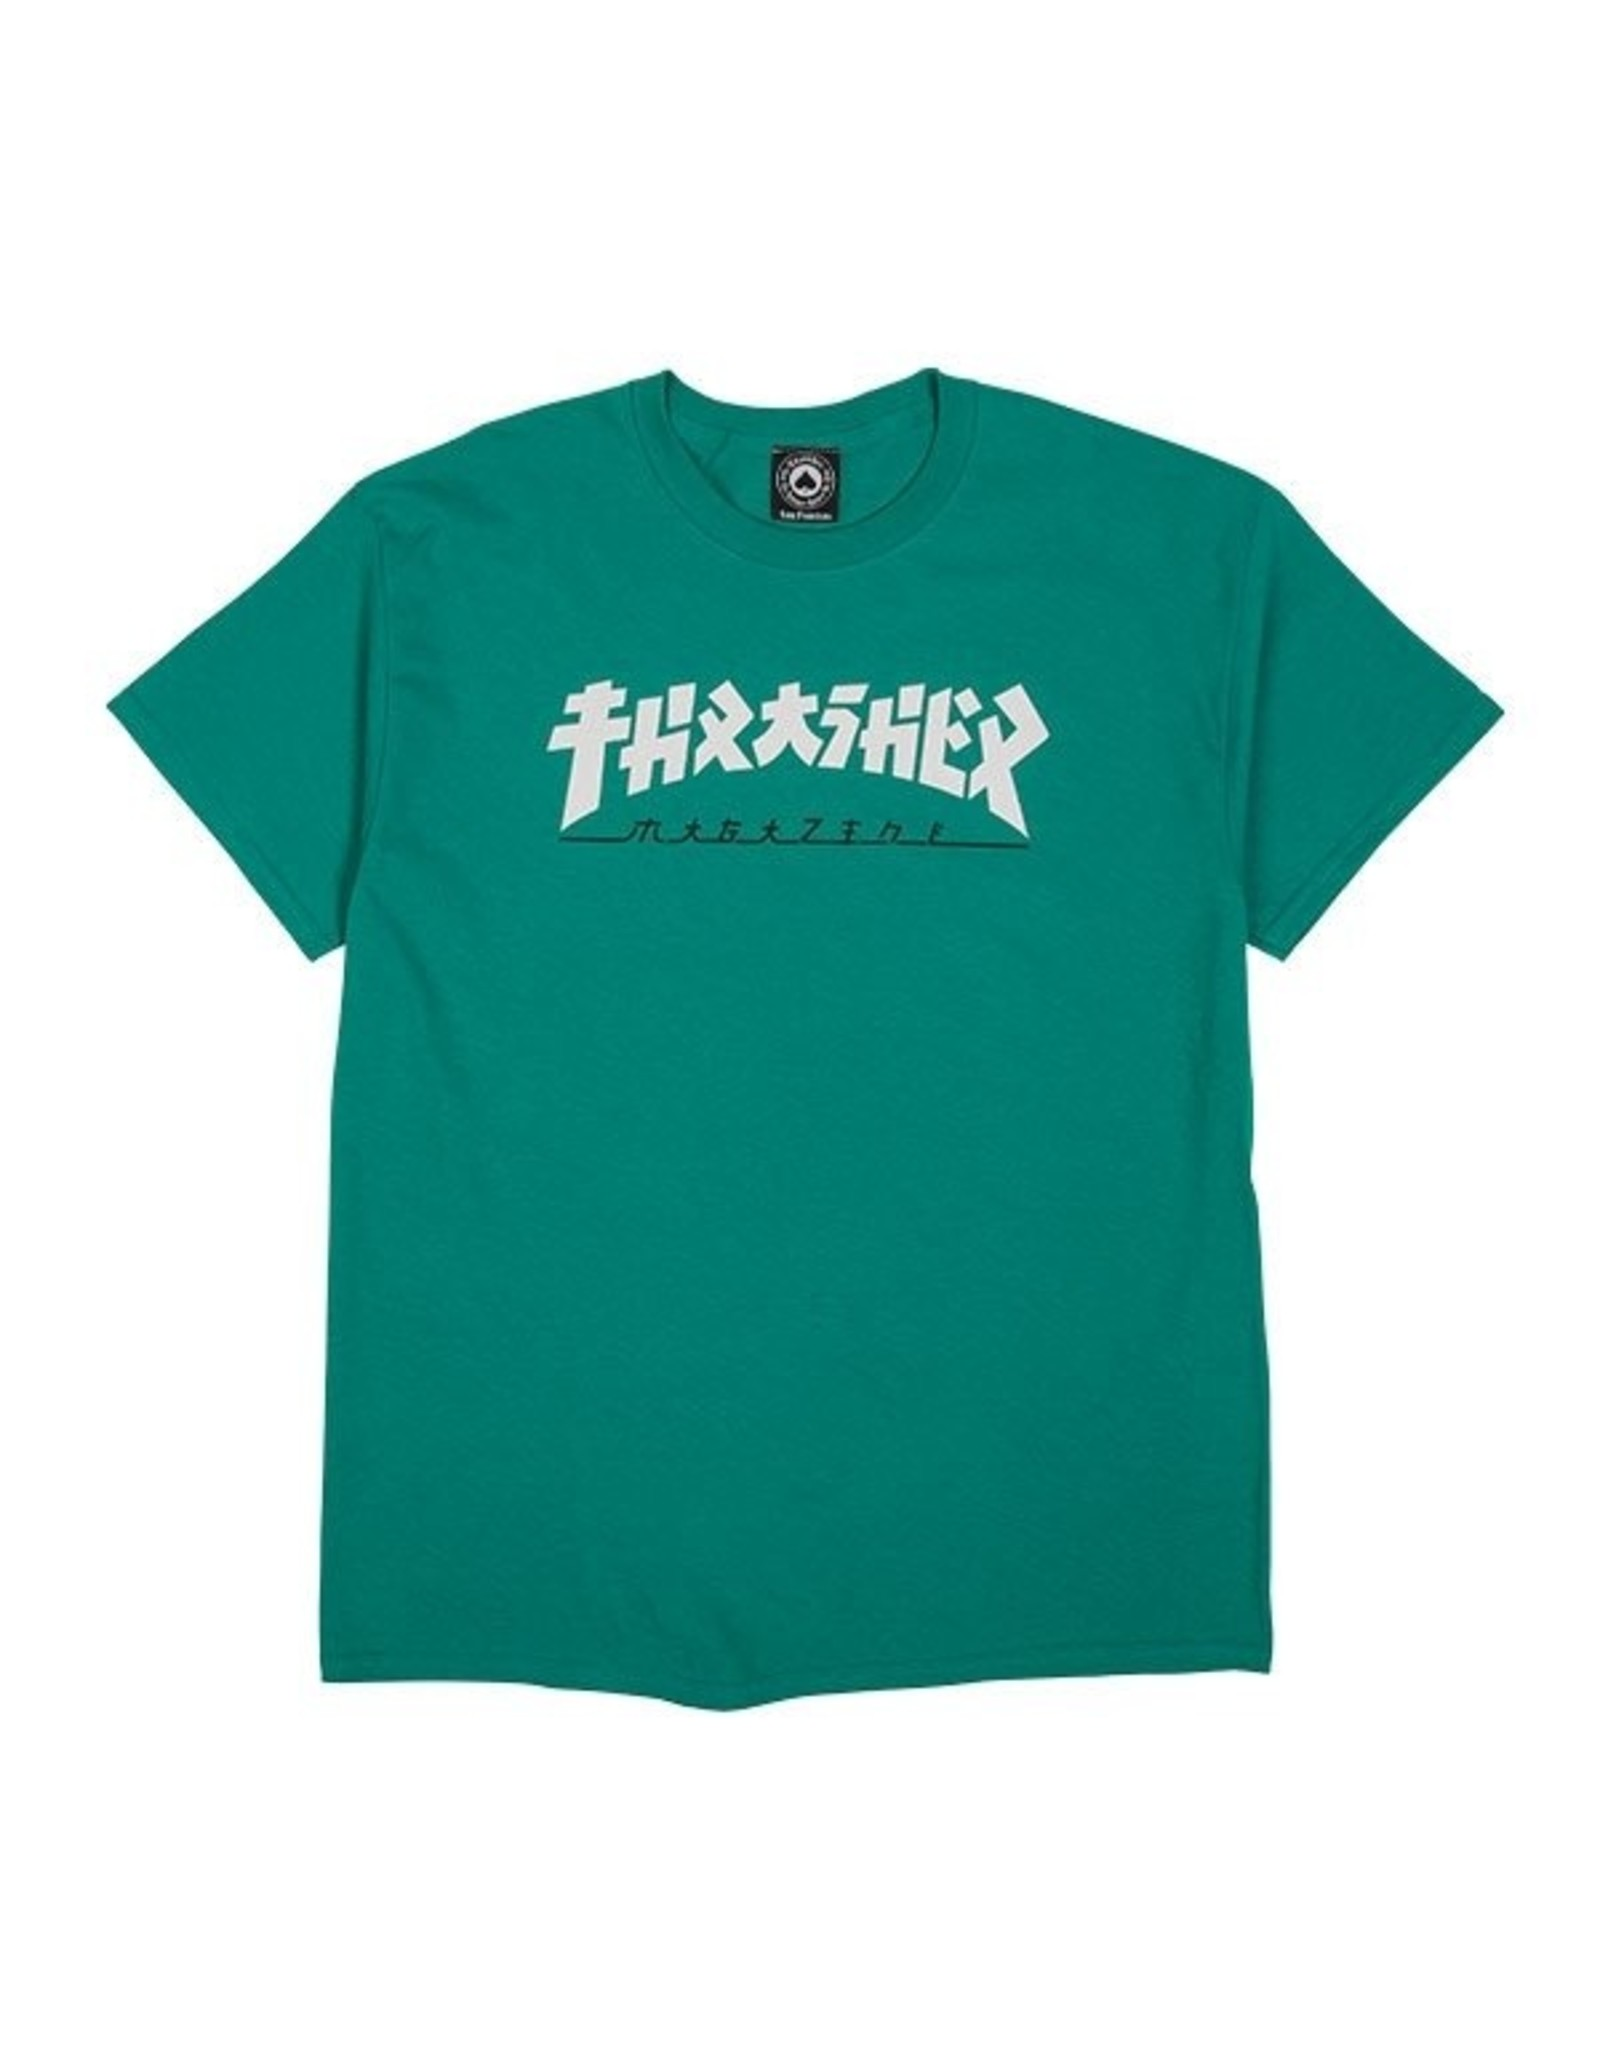 THRASHER THRASHER - GODZILLA S/S - JADE -